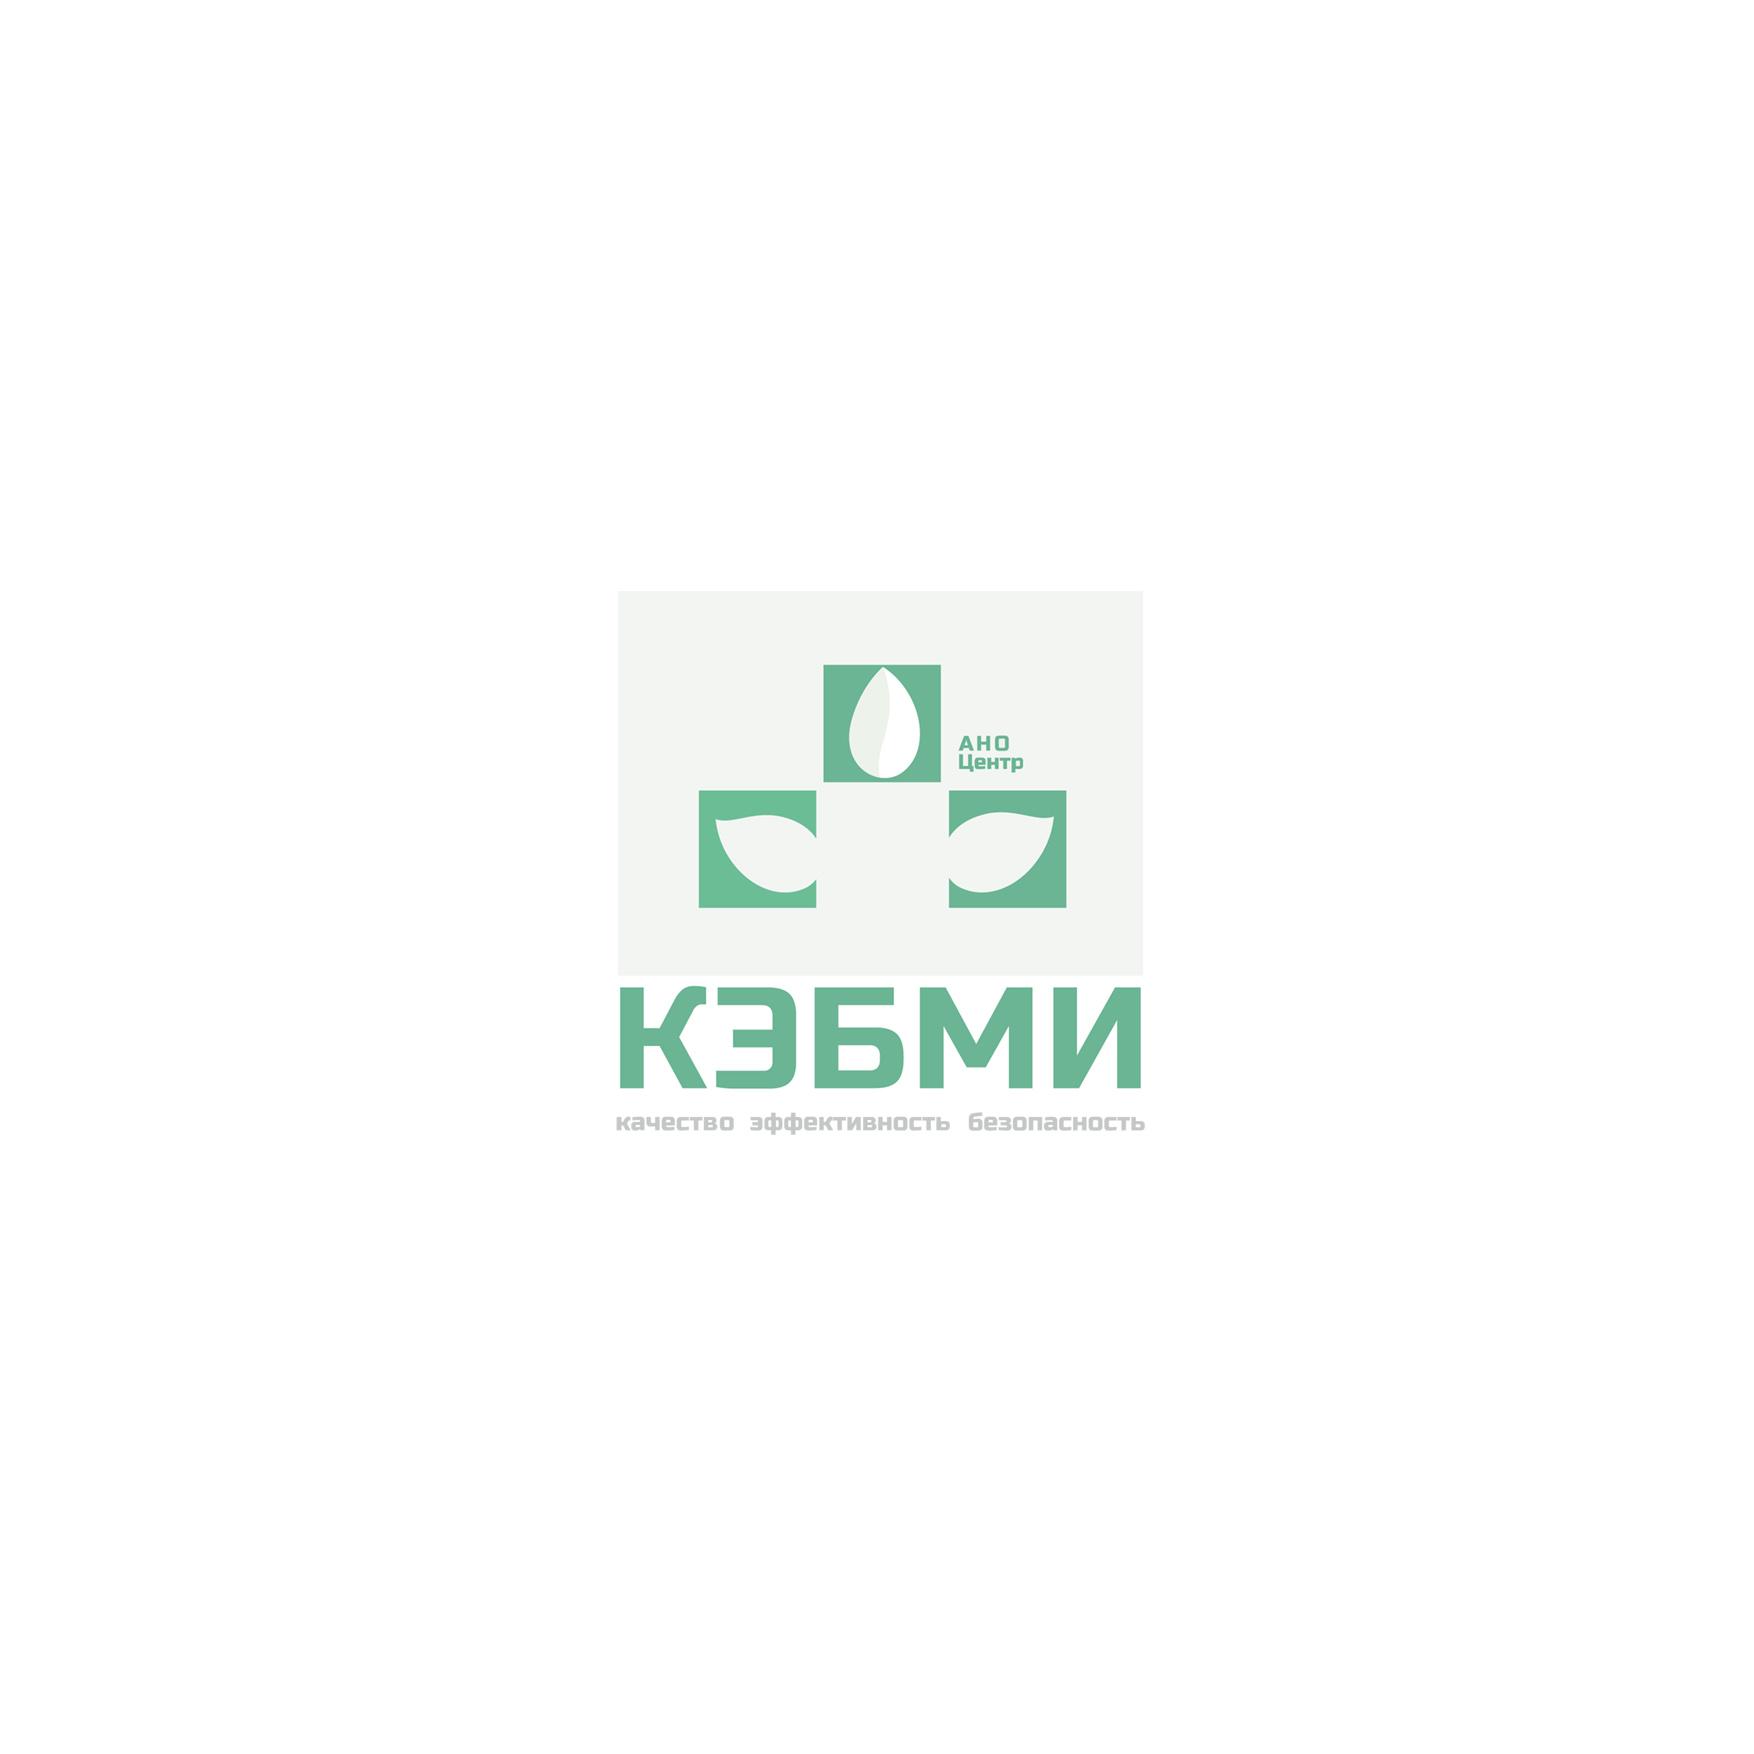 Редизайн логотипа АНО Центр КЭБМИ - BREVIS фото f_9905b2960ad6d898.jpg